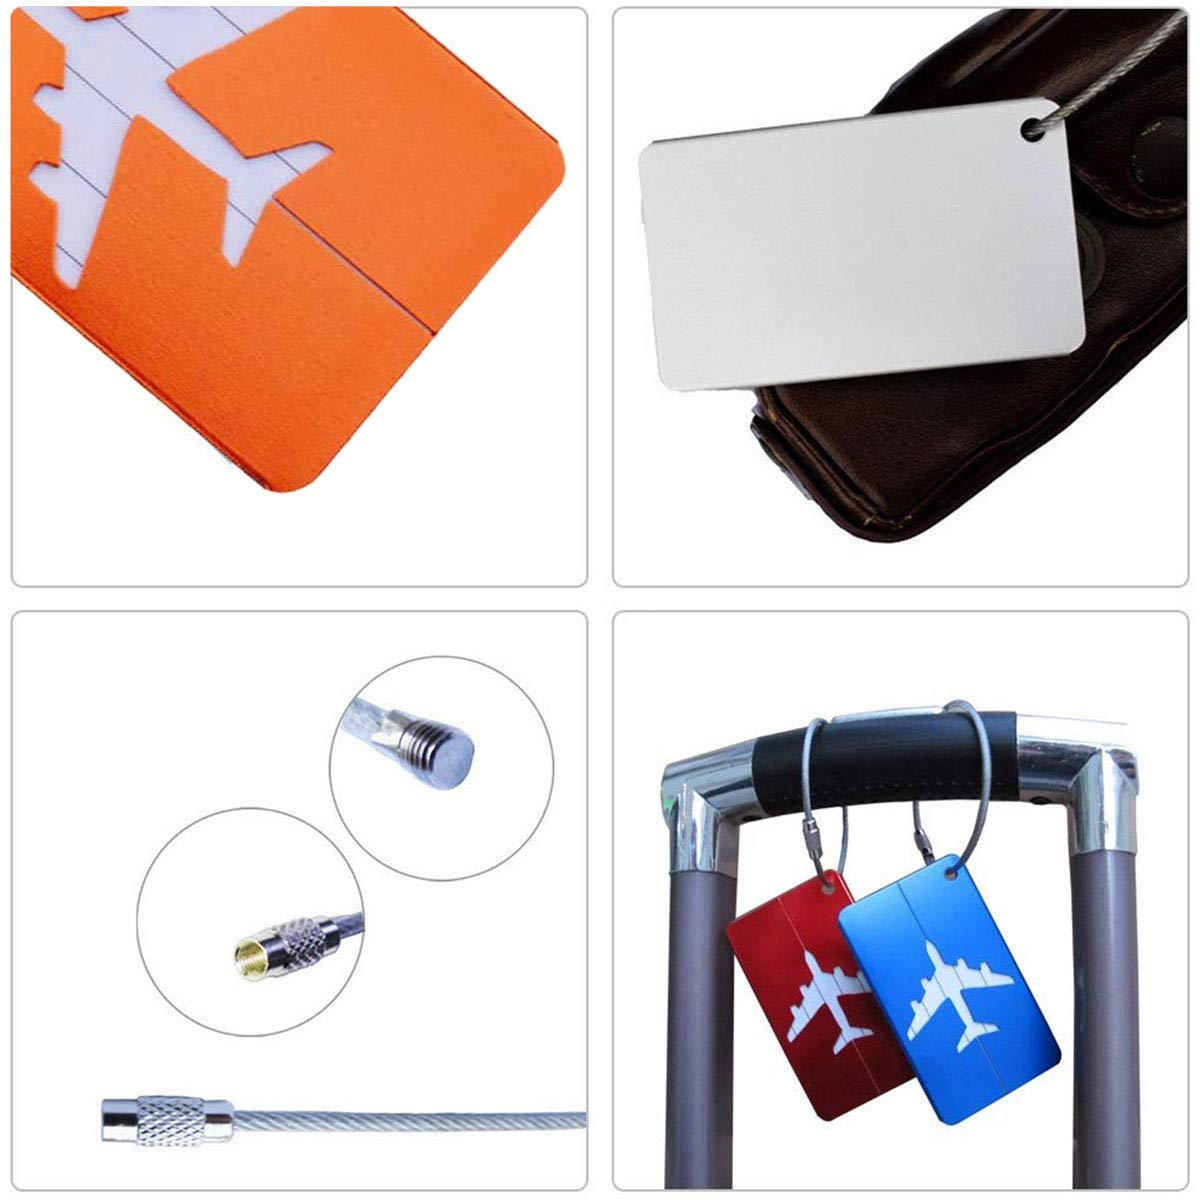 Plata, Negro, Azul, Rojo, Naranja Etiquetas para Equipaje Etiquetas de identificaci/ón para Maleta Etiquetas para Equipaje de Mano Paquete de 5